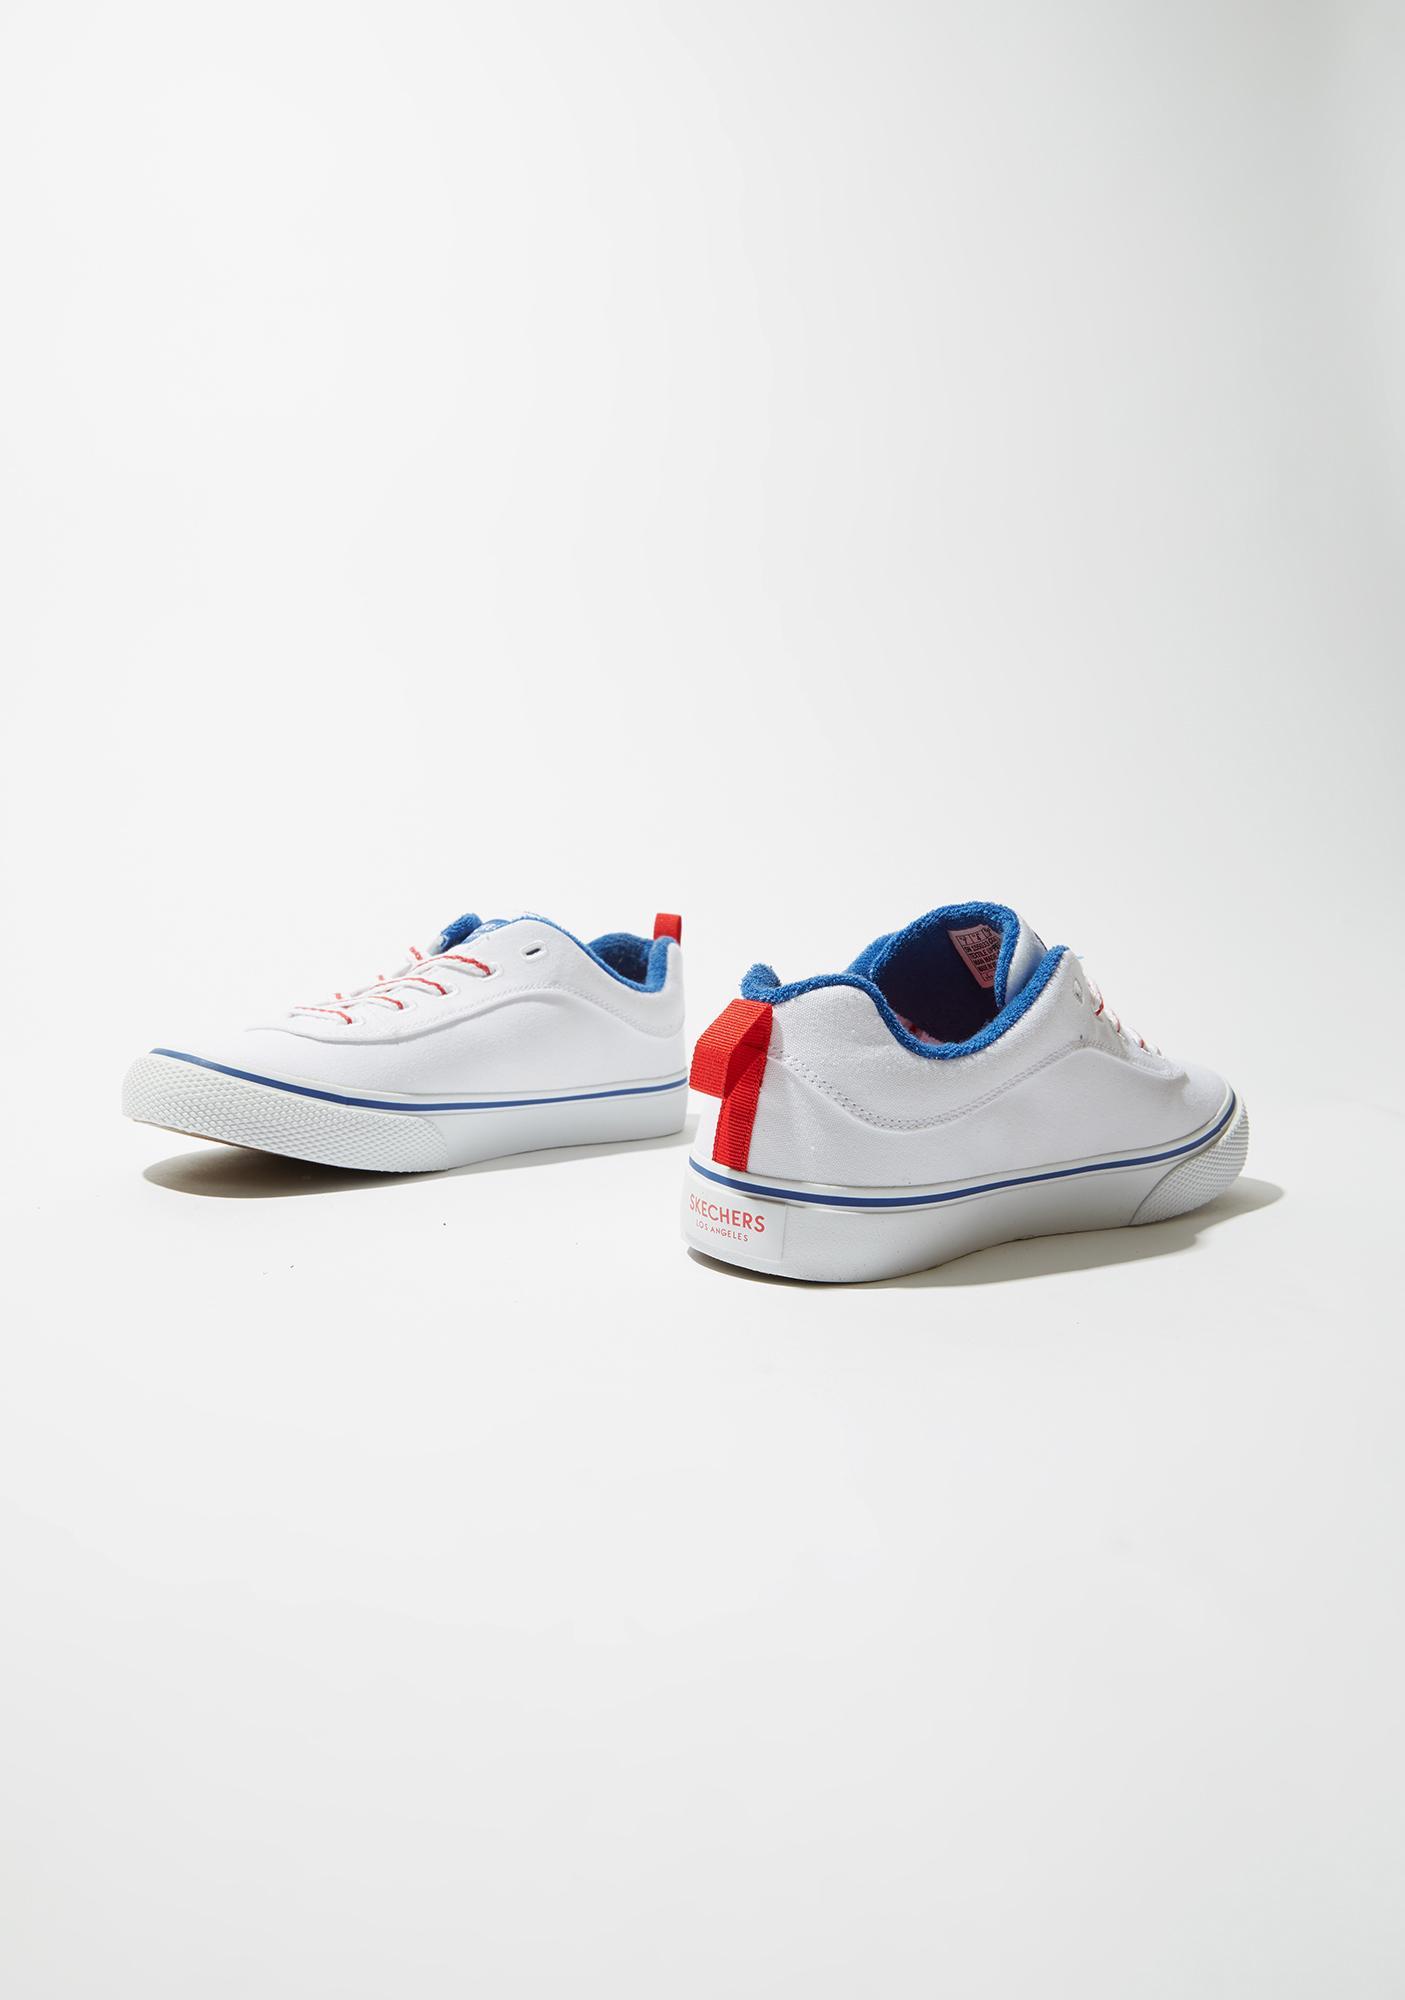 Skechers White V'Lites Stitch N Stride Sneakers